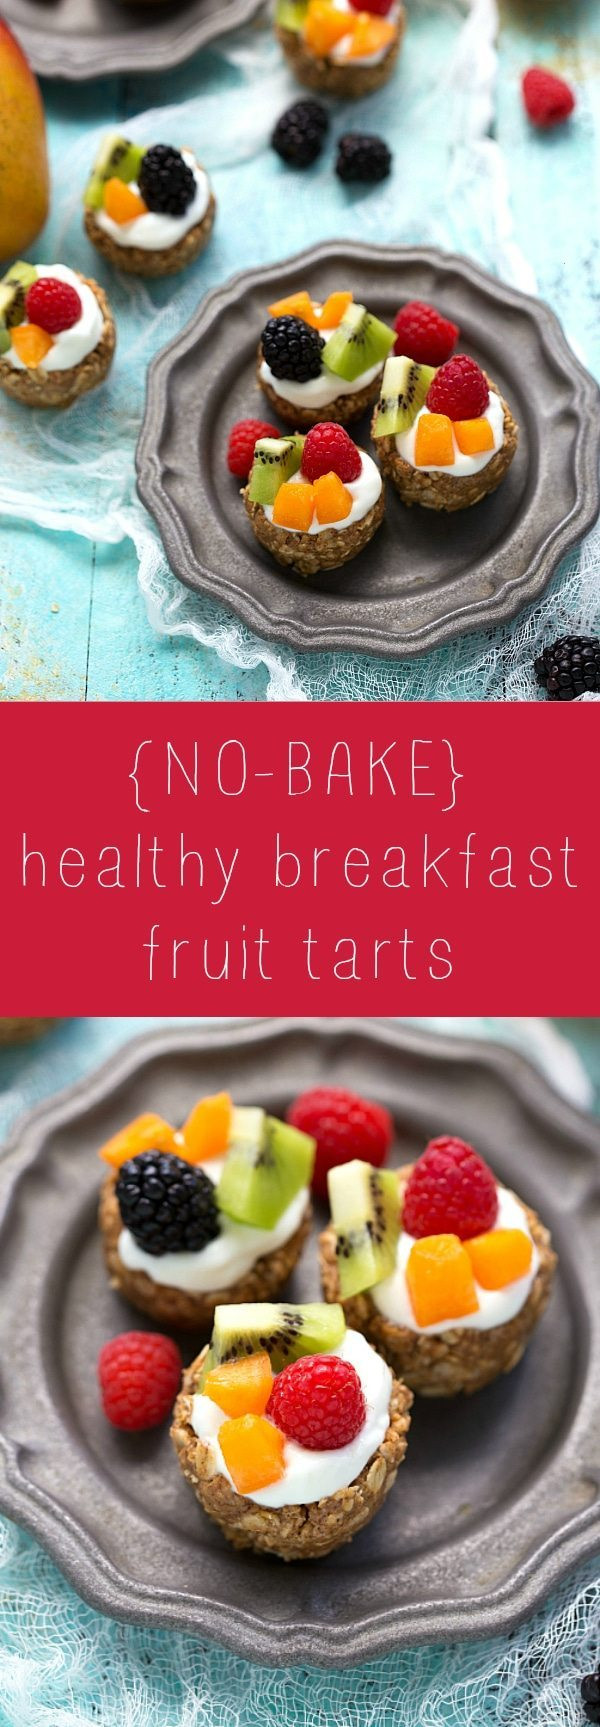 Healthy Breakfast Baking Recipes 20 Ideas for No Bake Healthy Breakfast Fruit Tarts Chelsea S Messy